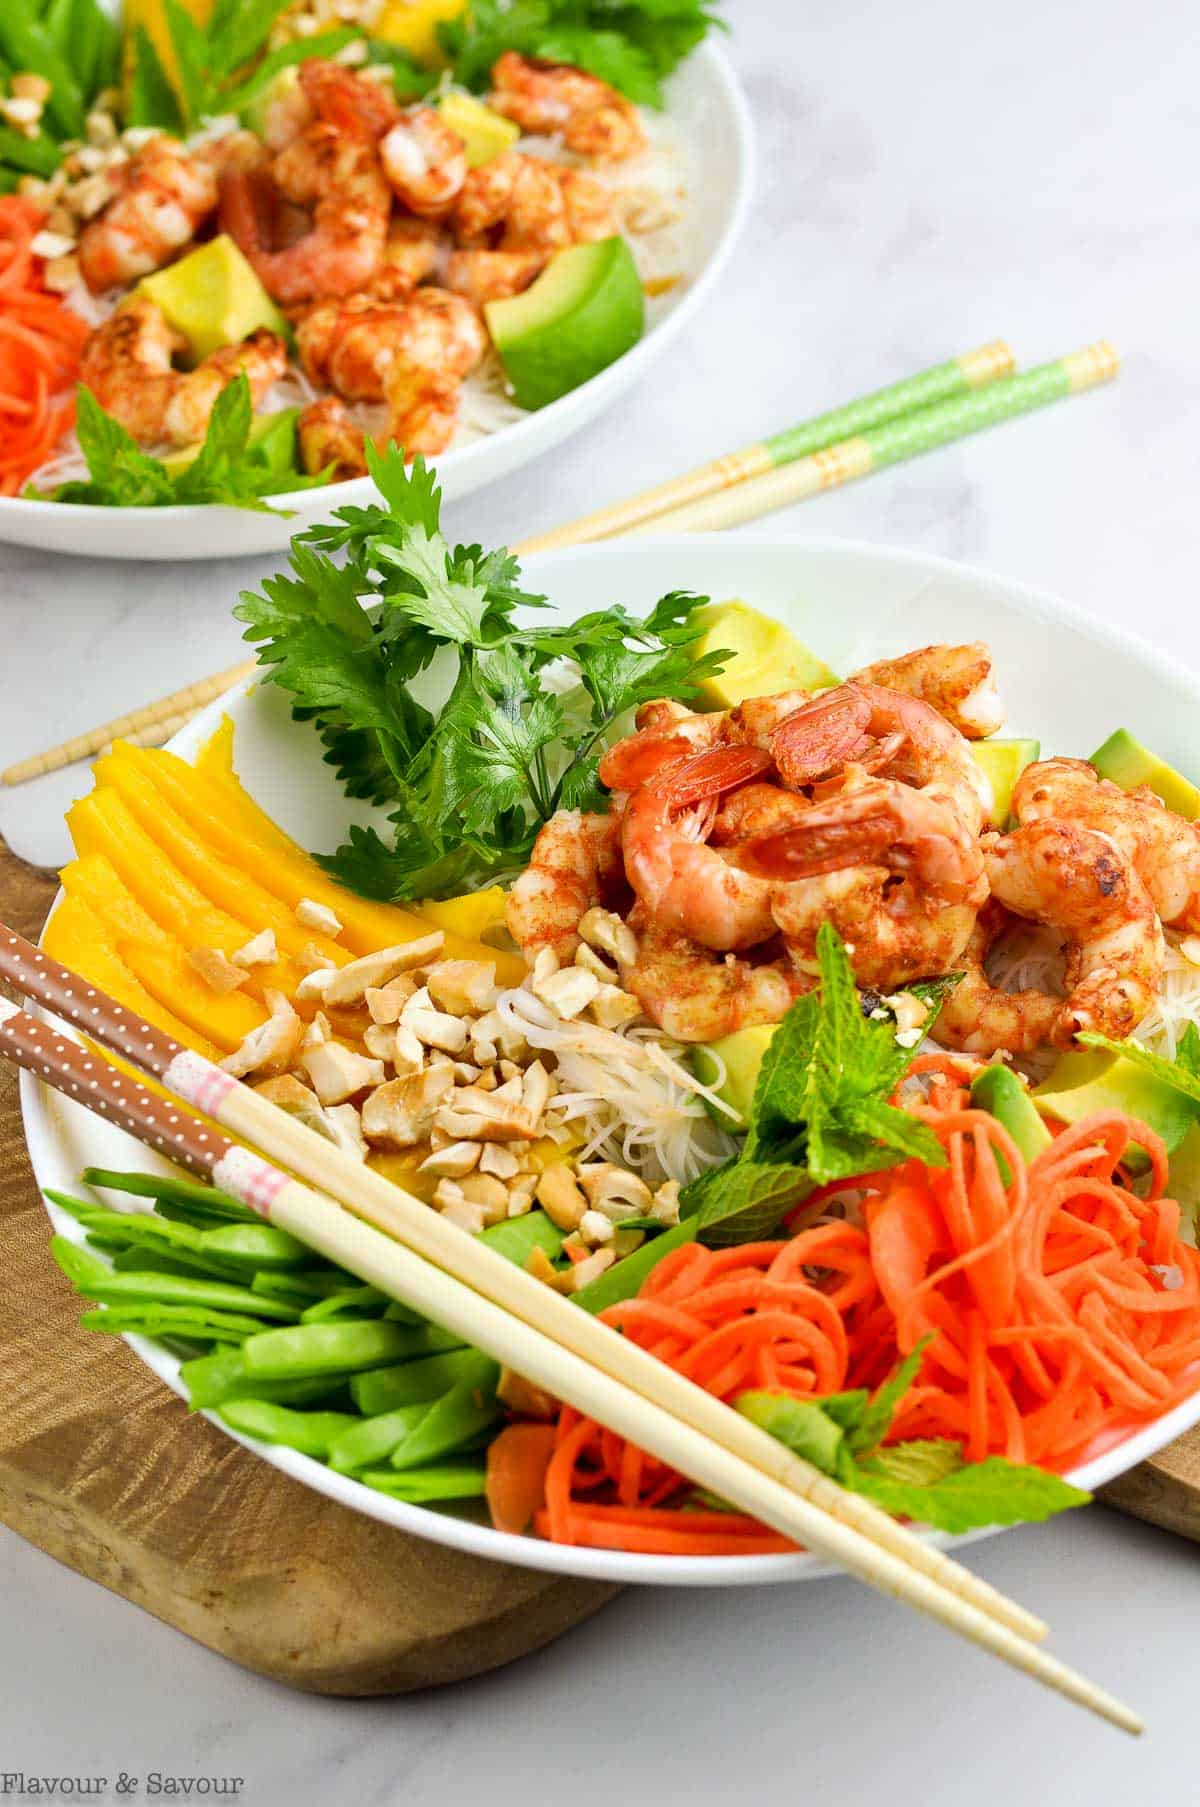 Vietnamese Prawn or Shrimp Noodle Bowl with a set of chopsticks.